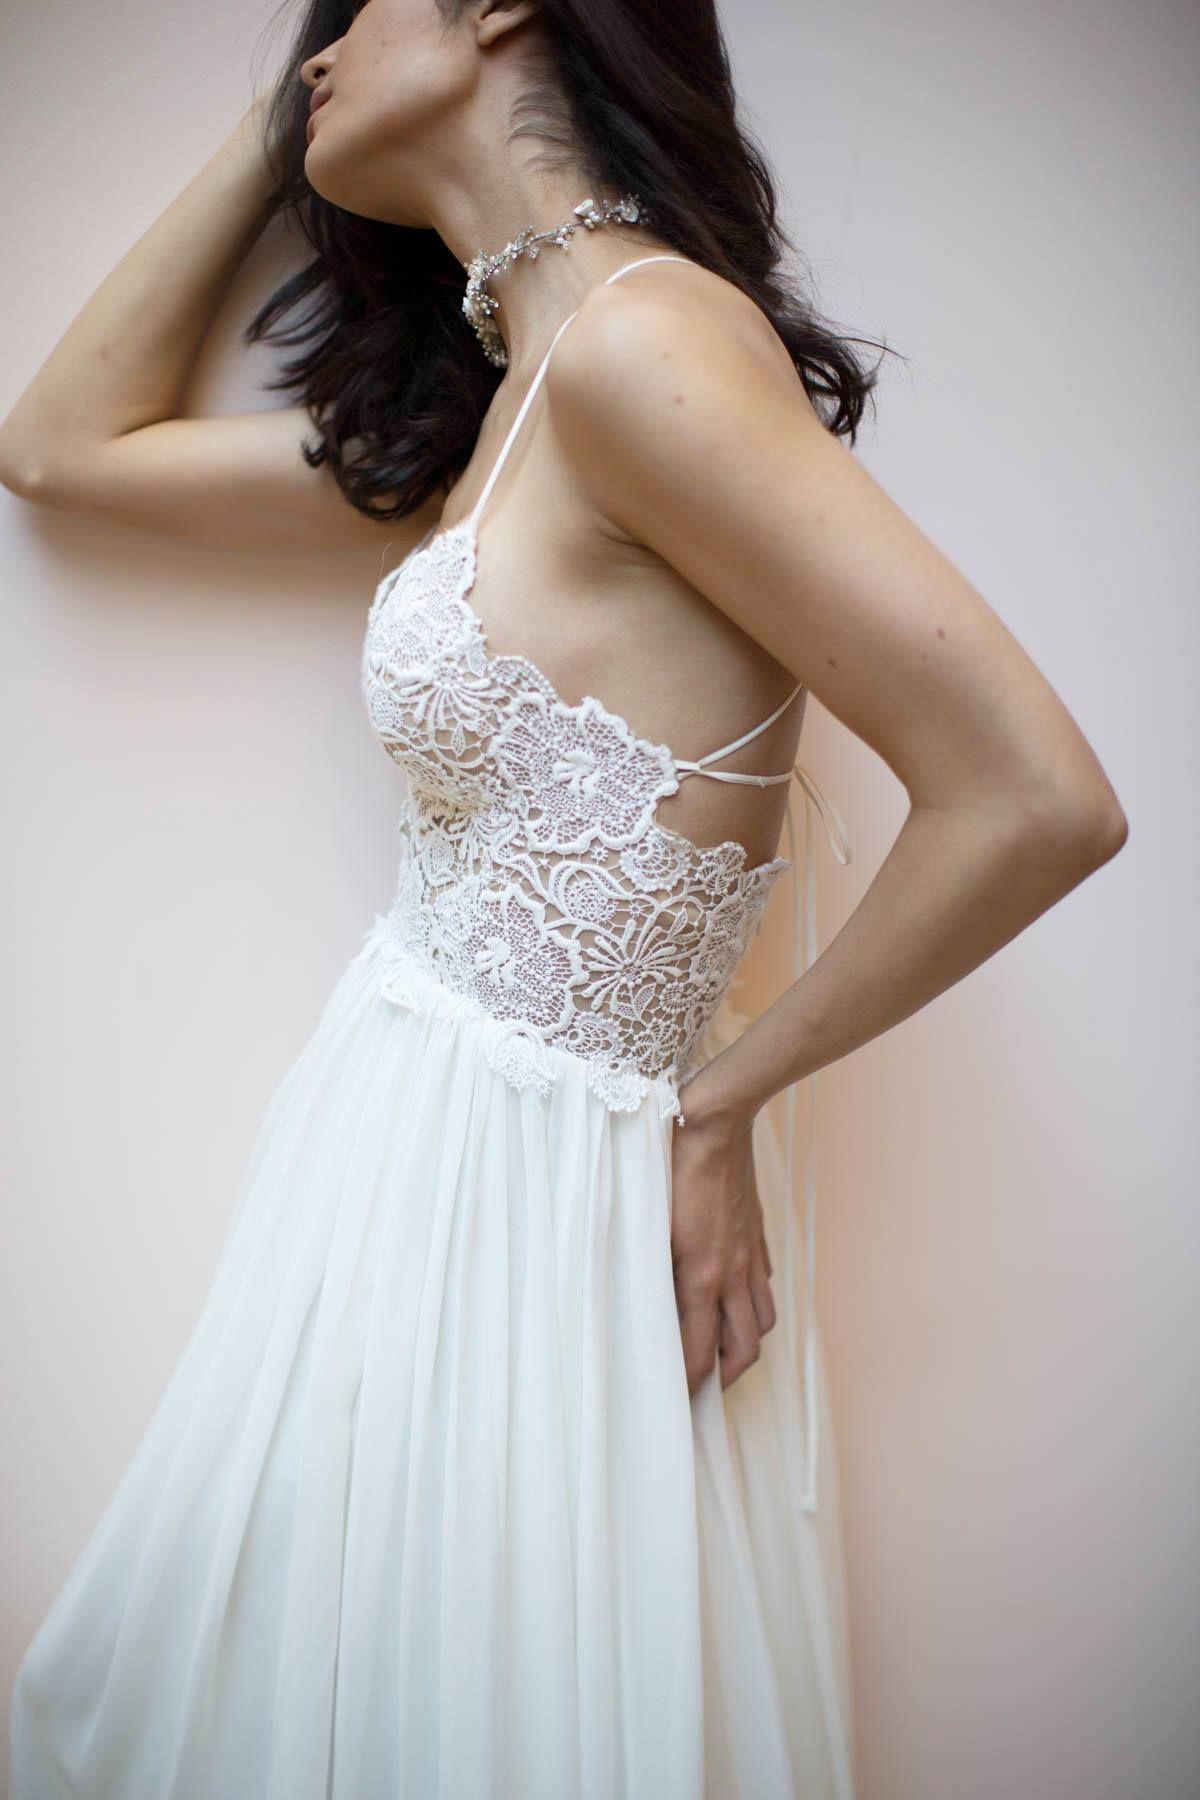 Lace strap wedding dress  Sarah Seven theromanticscollection Whitman Gown romantic lace